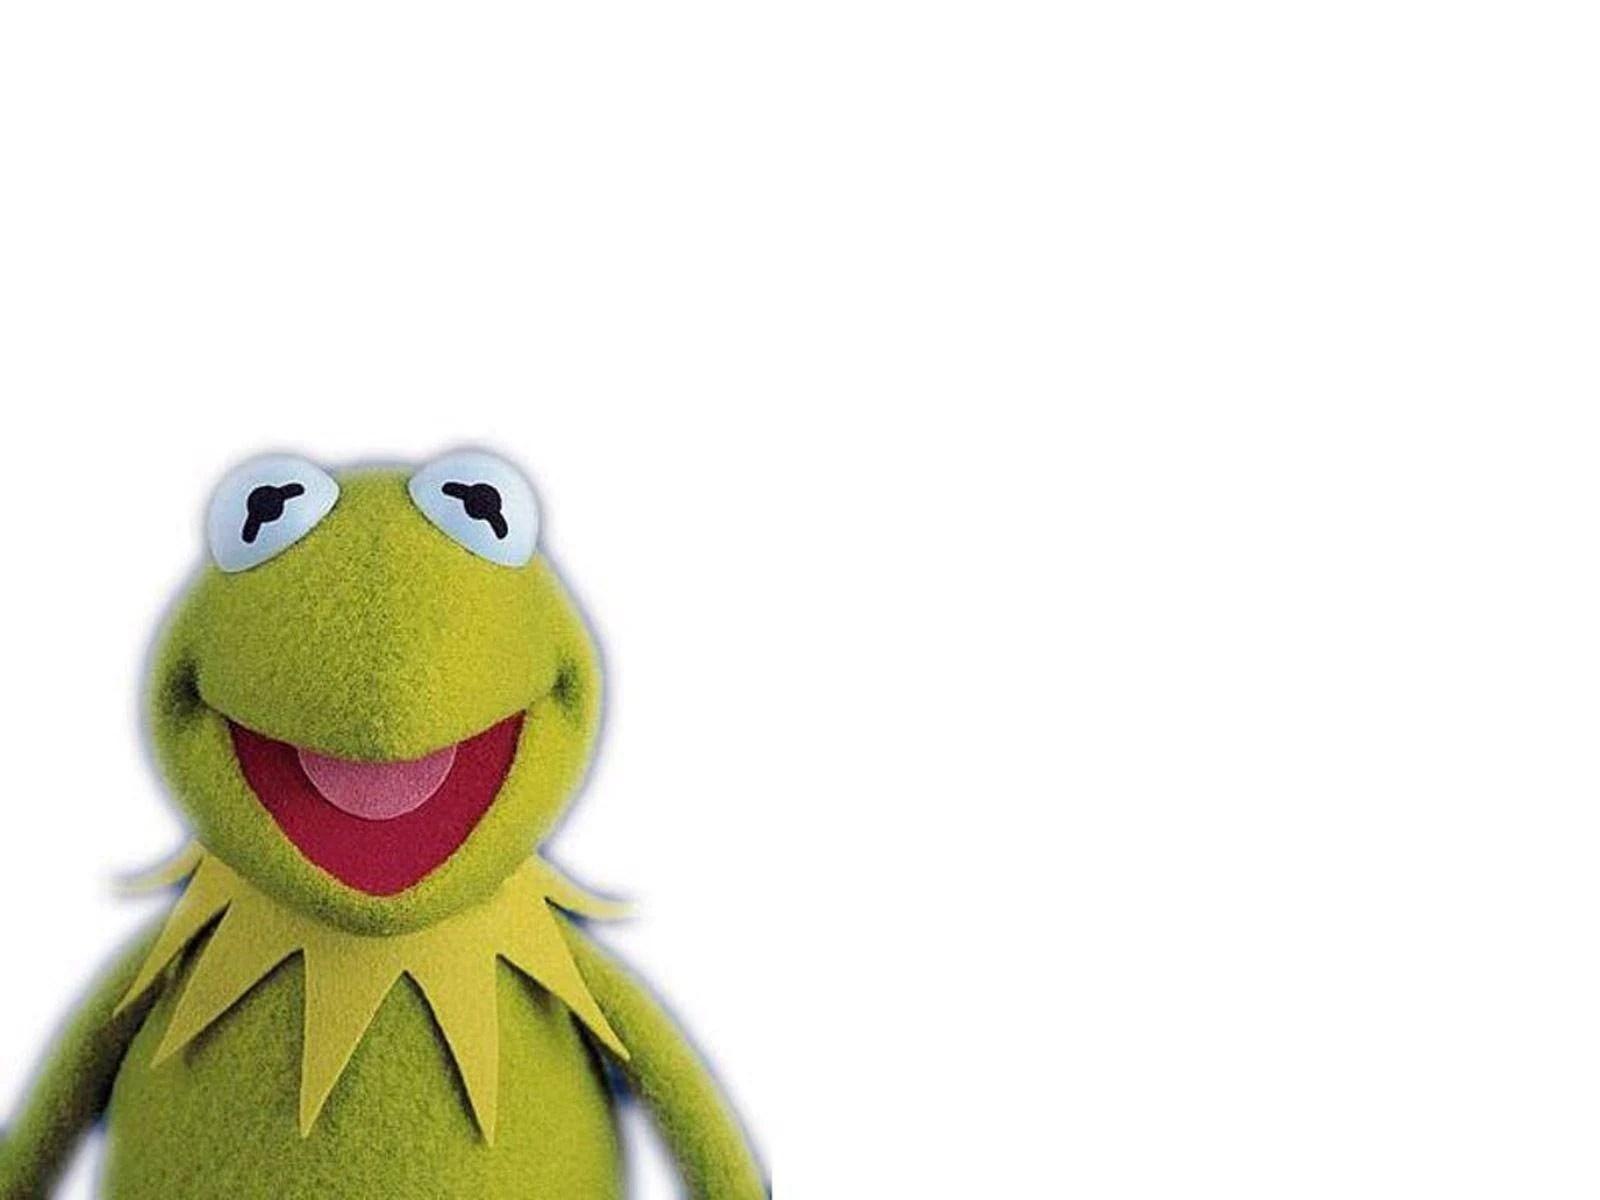 Kermit The Frog Wallpapers Wallpaper Cave